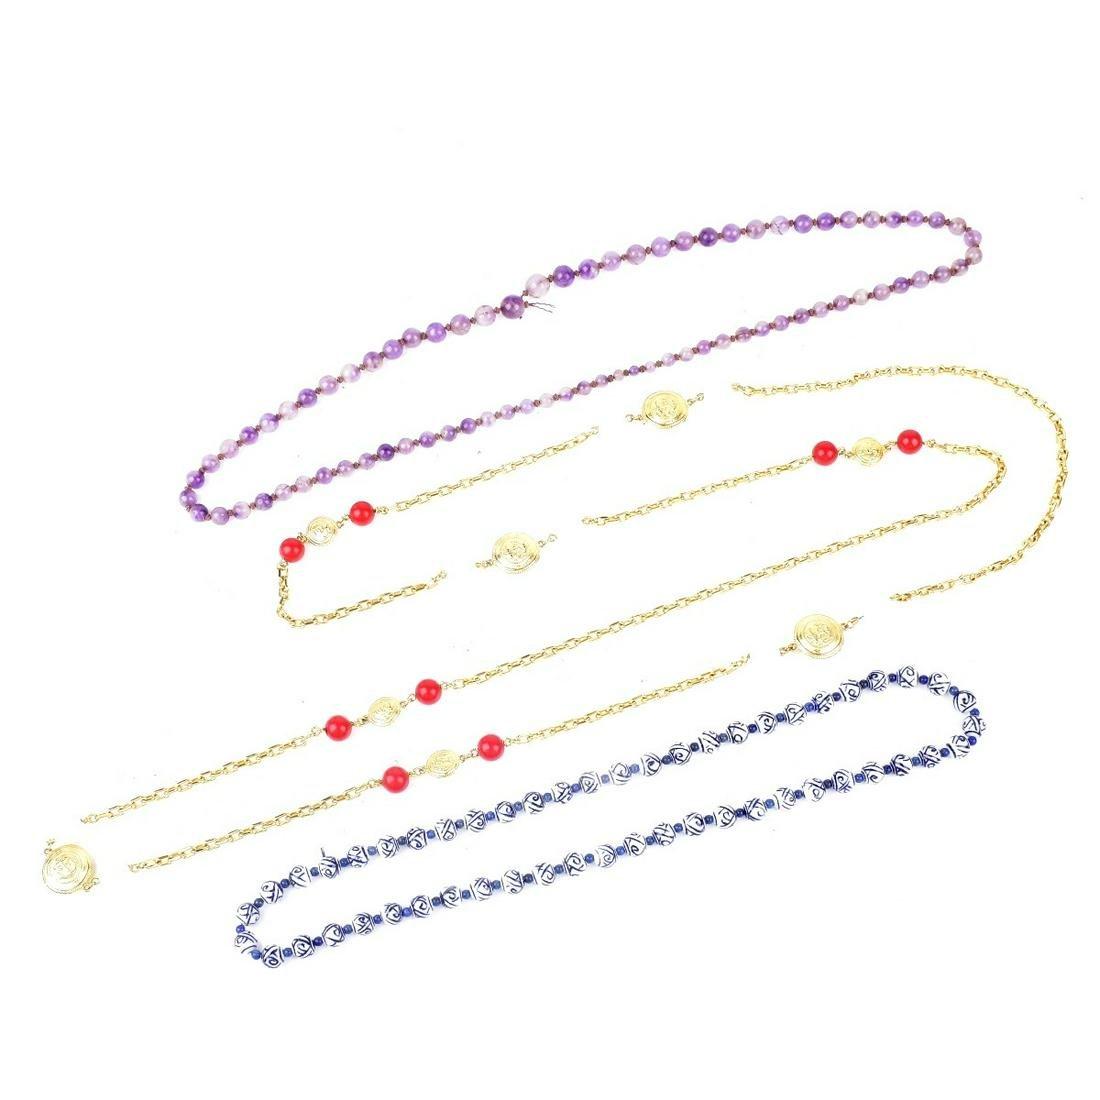 Three Vintage Fashion Necklaces